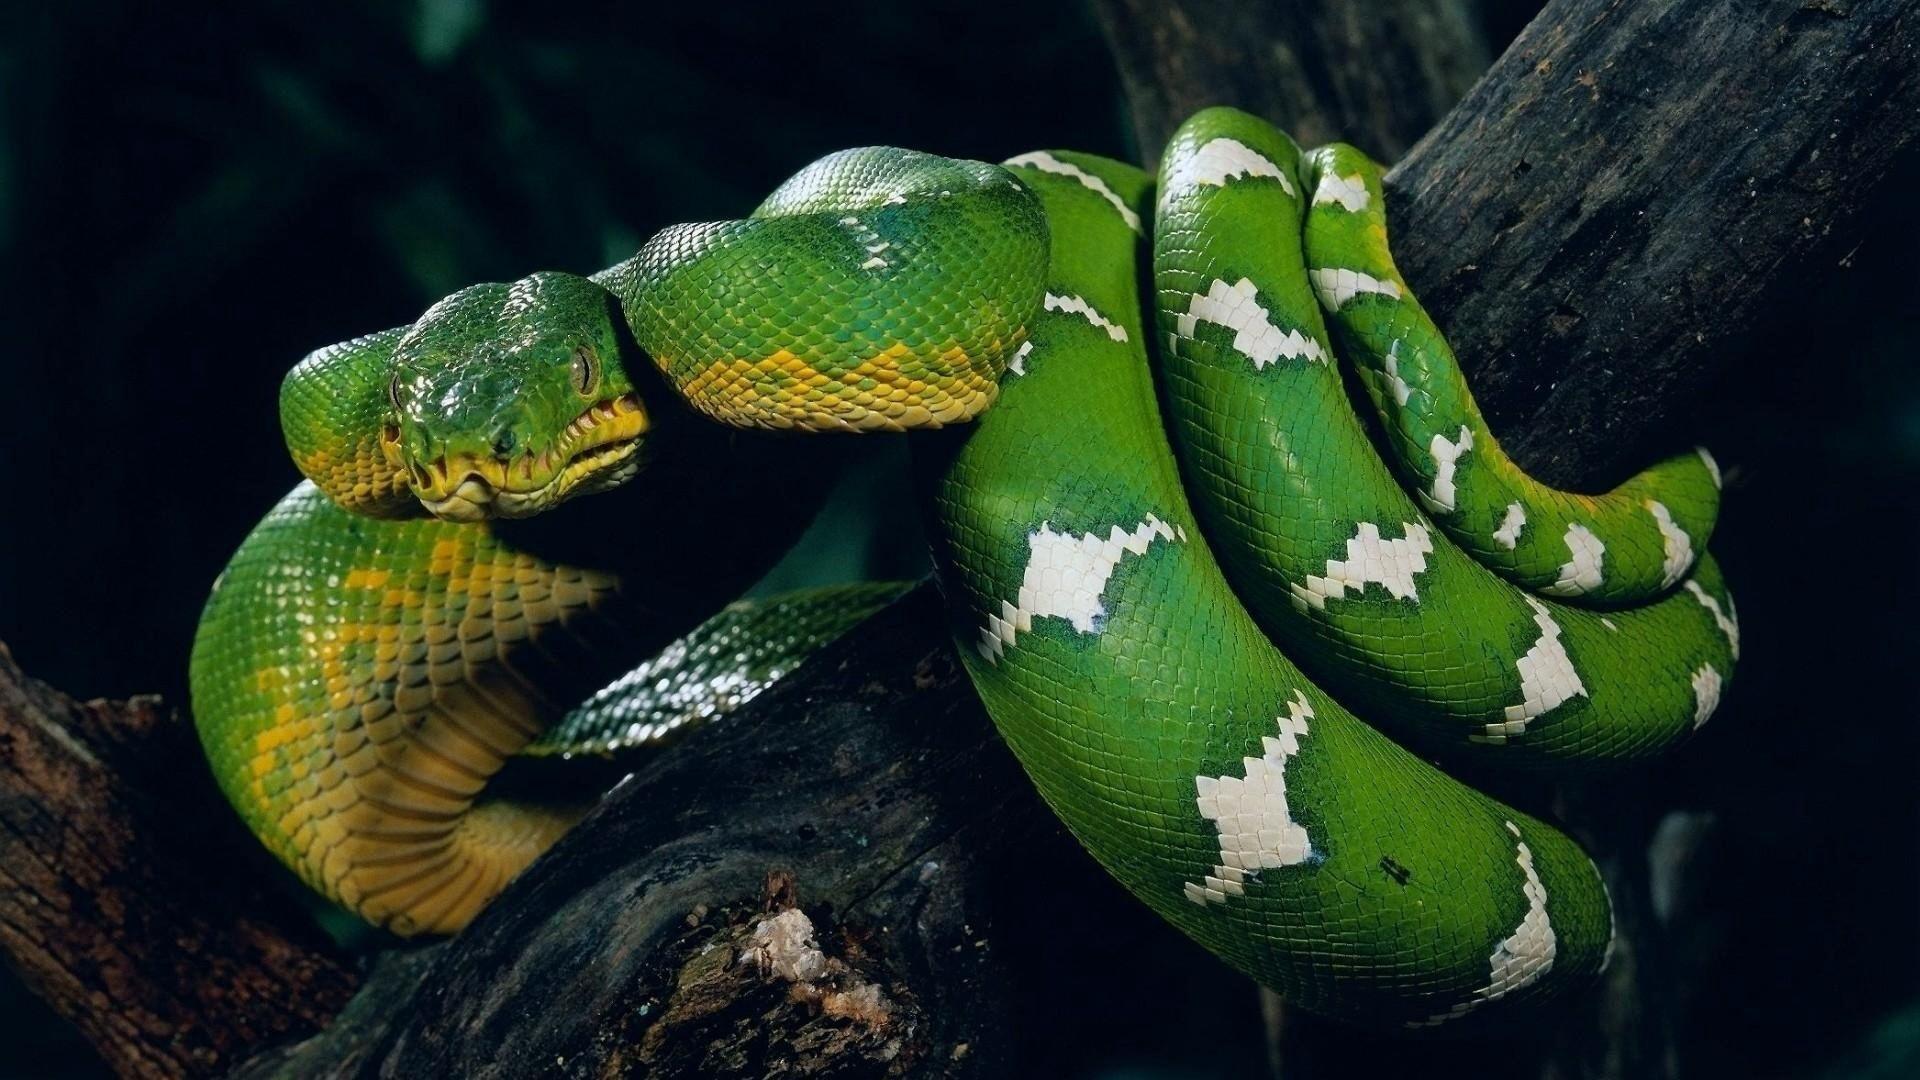 Green Snake Photo